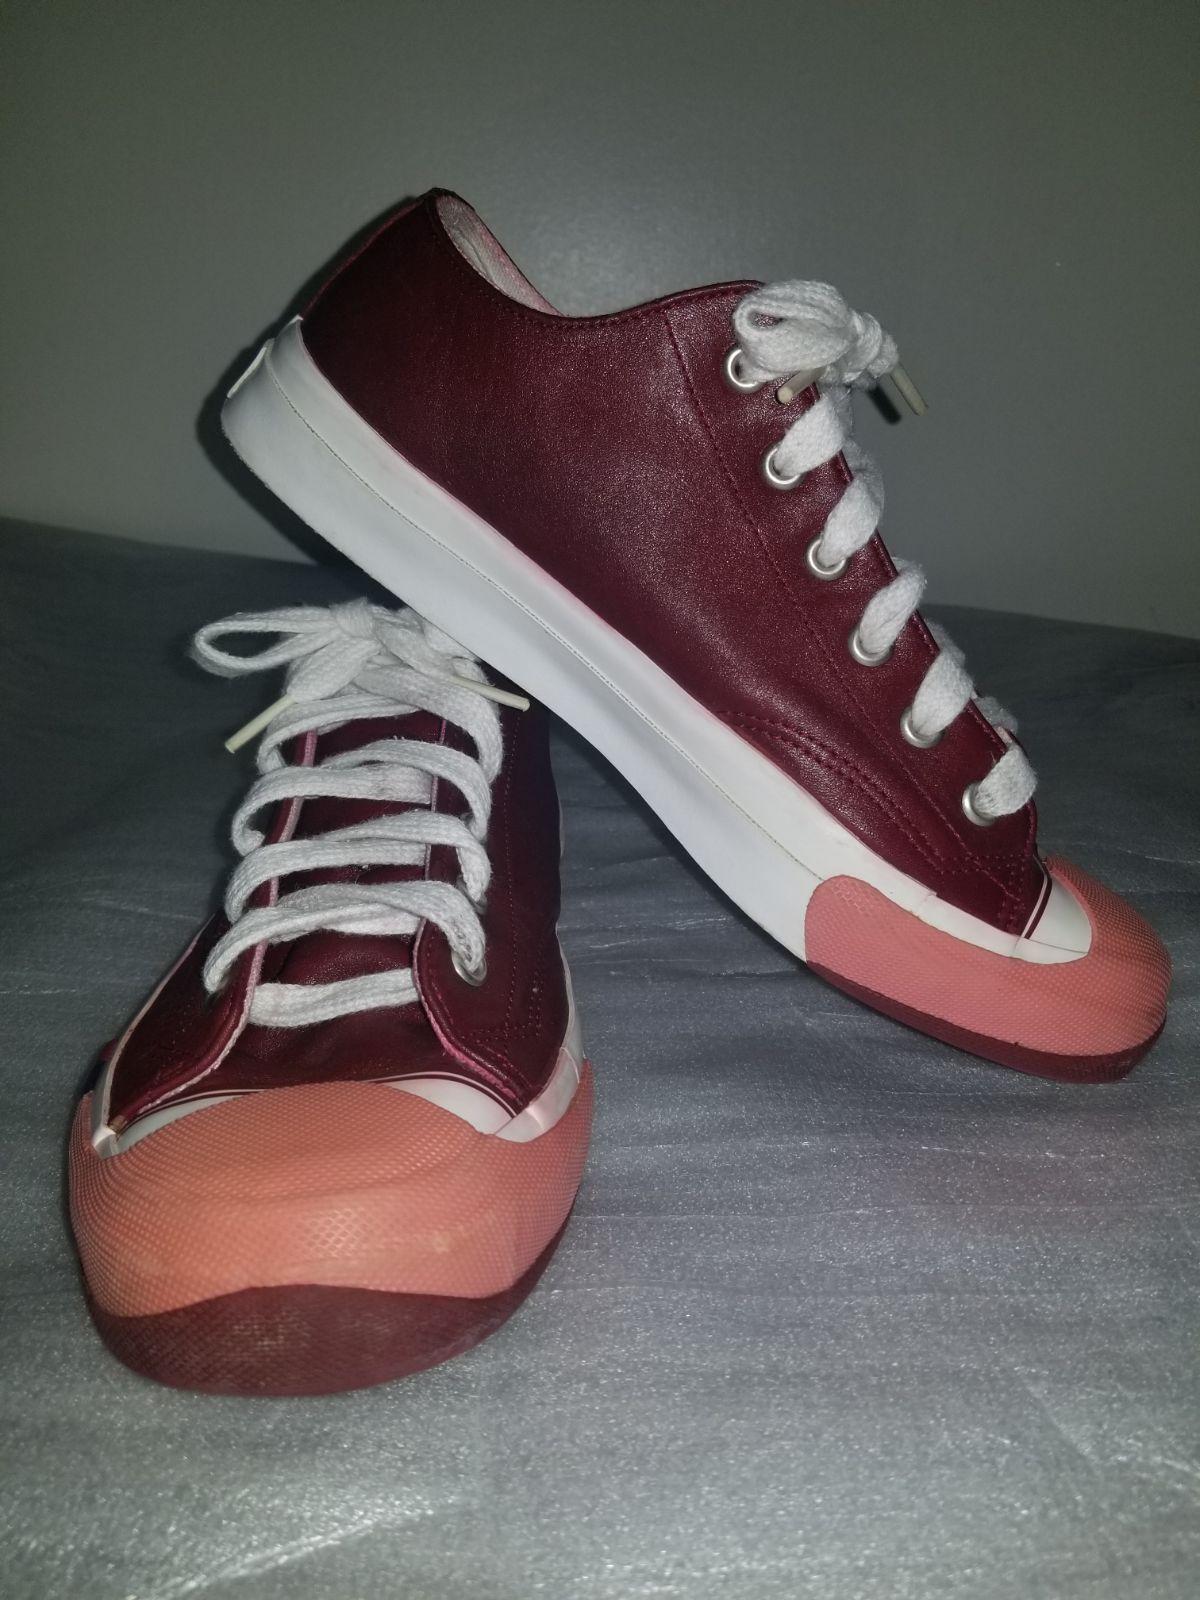 Keds, Mens flip flops, Pro keds sneakers